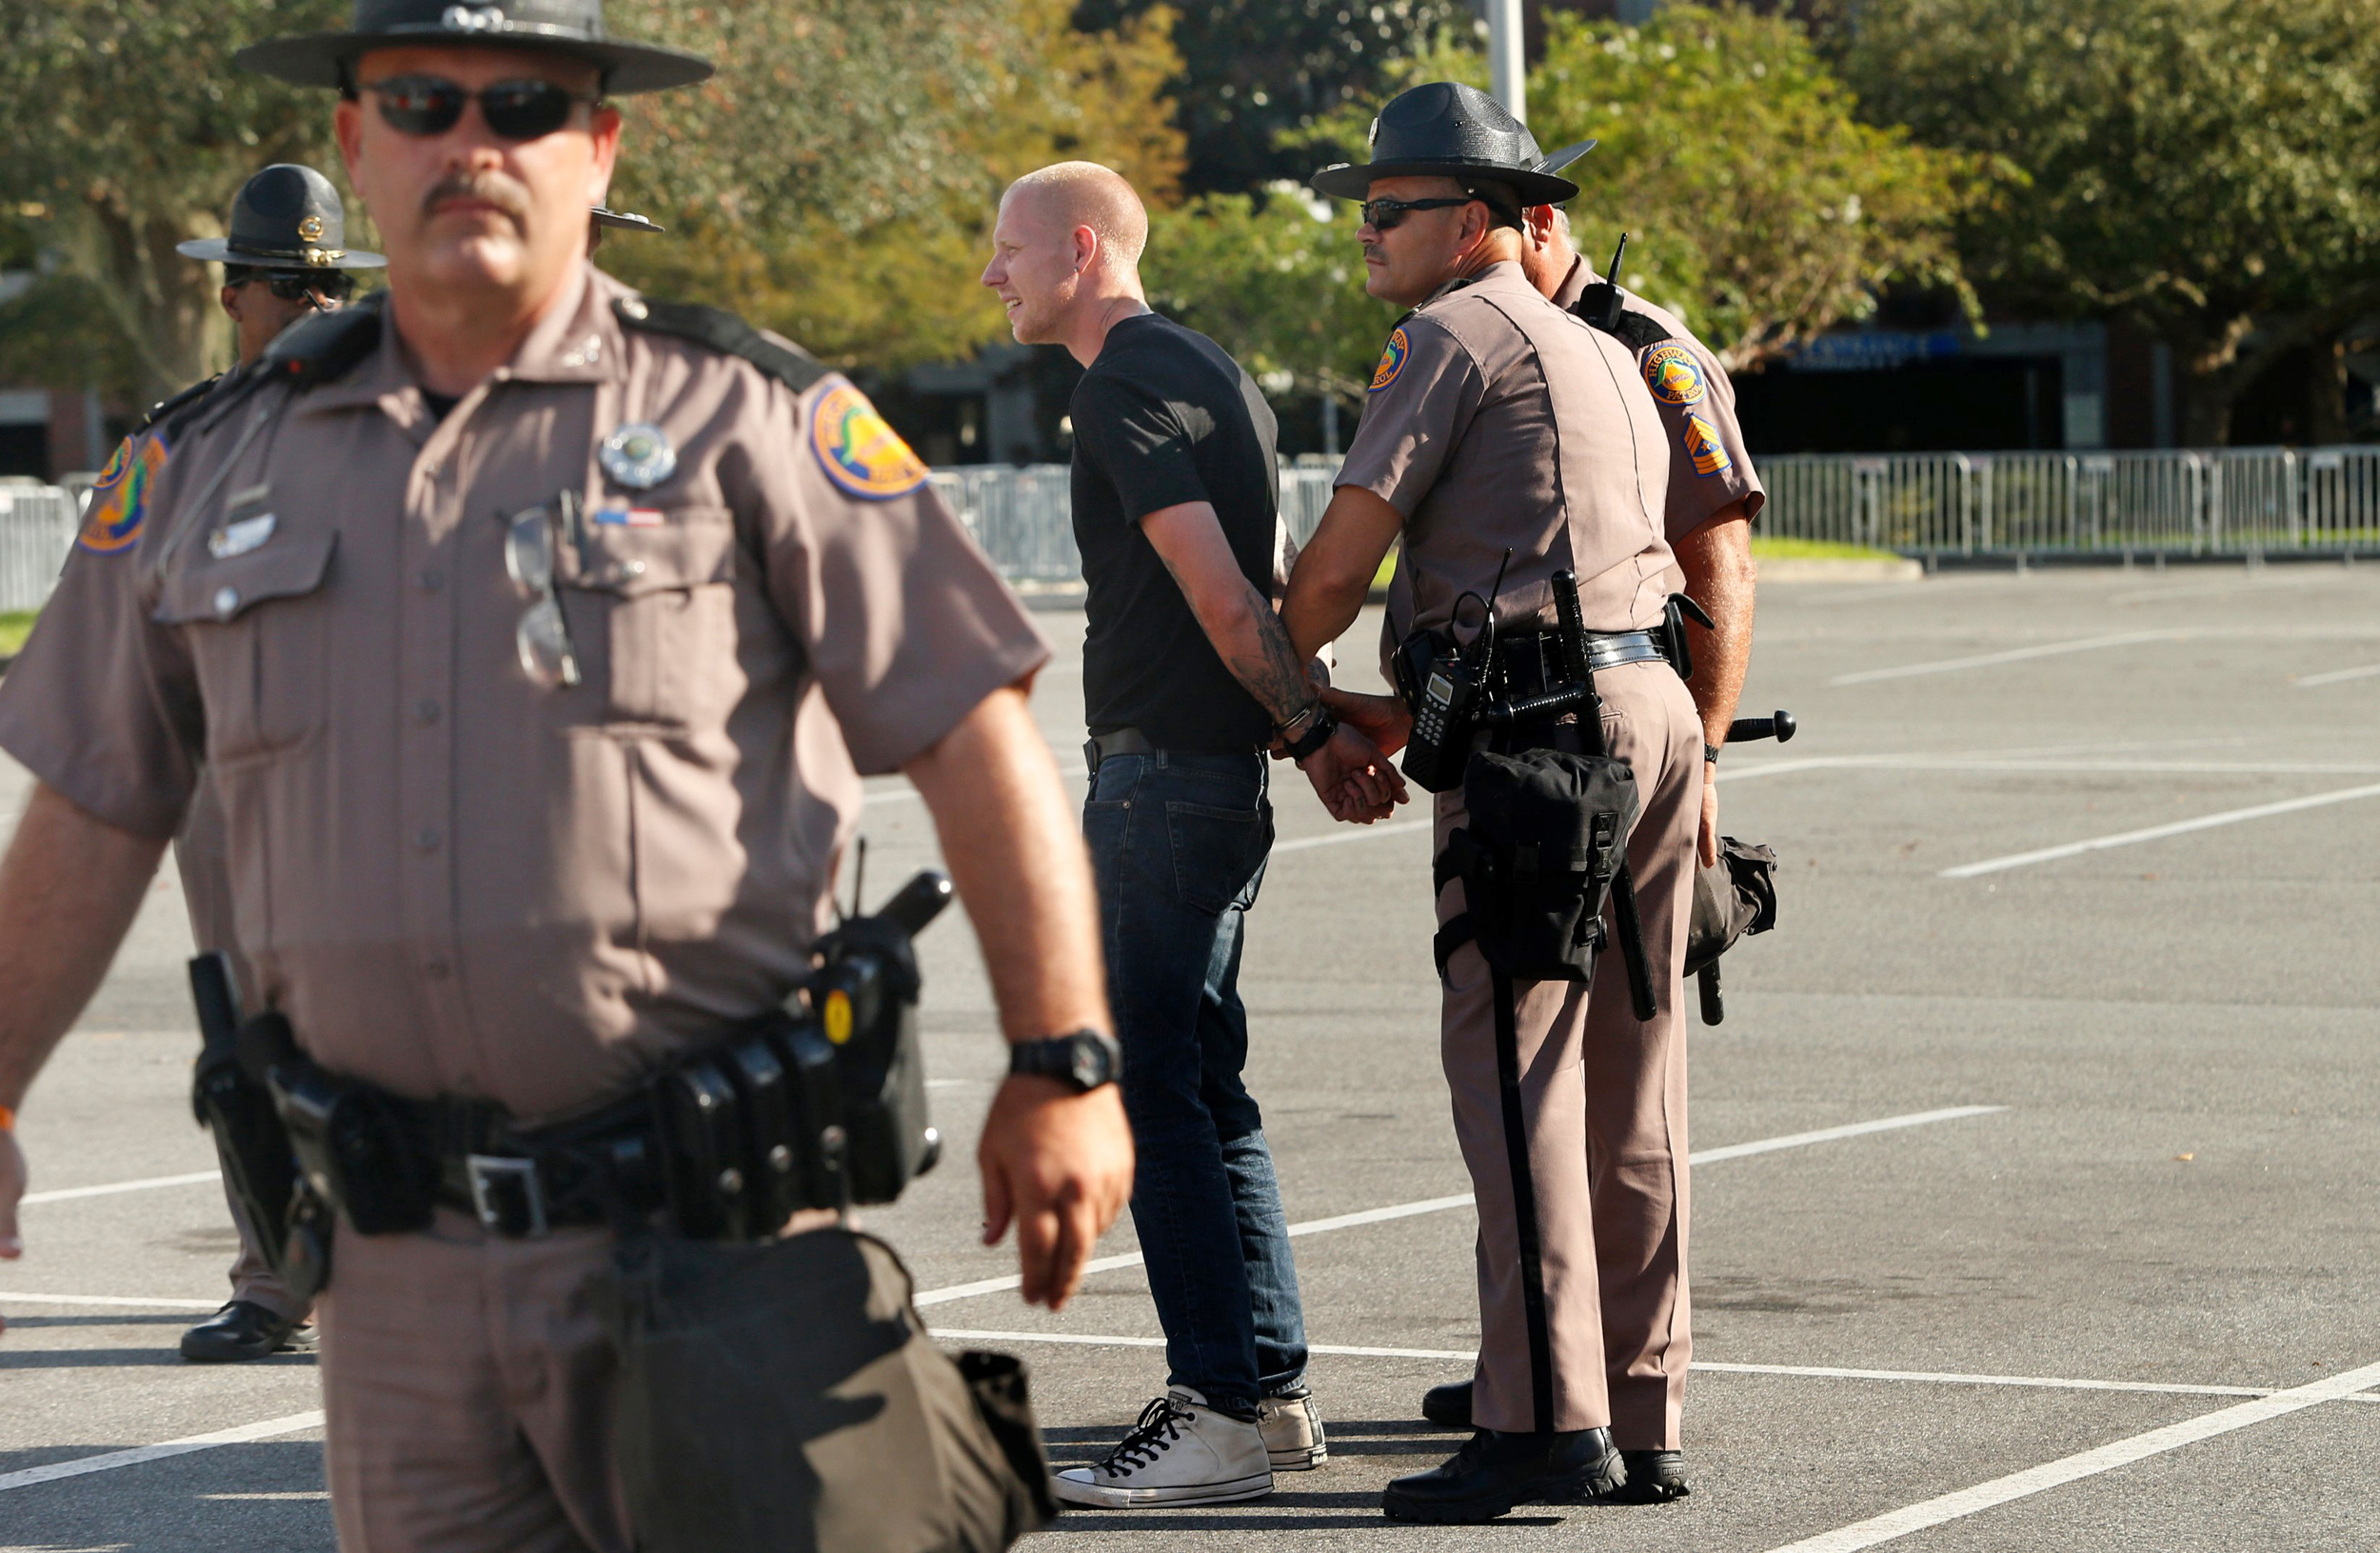 Image: Tensions High As Alt-Right Activist Richard Spencer Visits U. Florida Campus